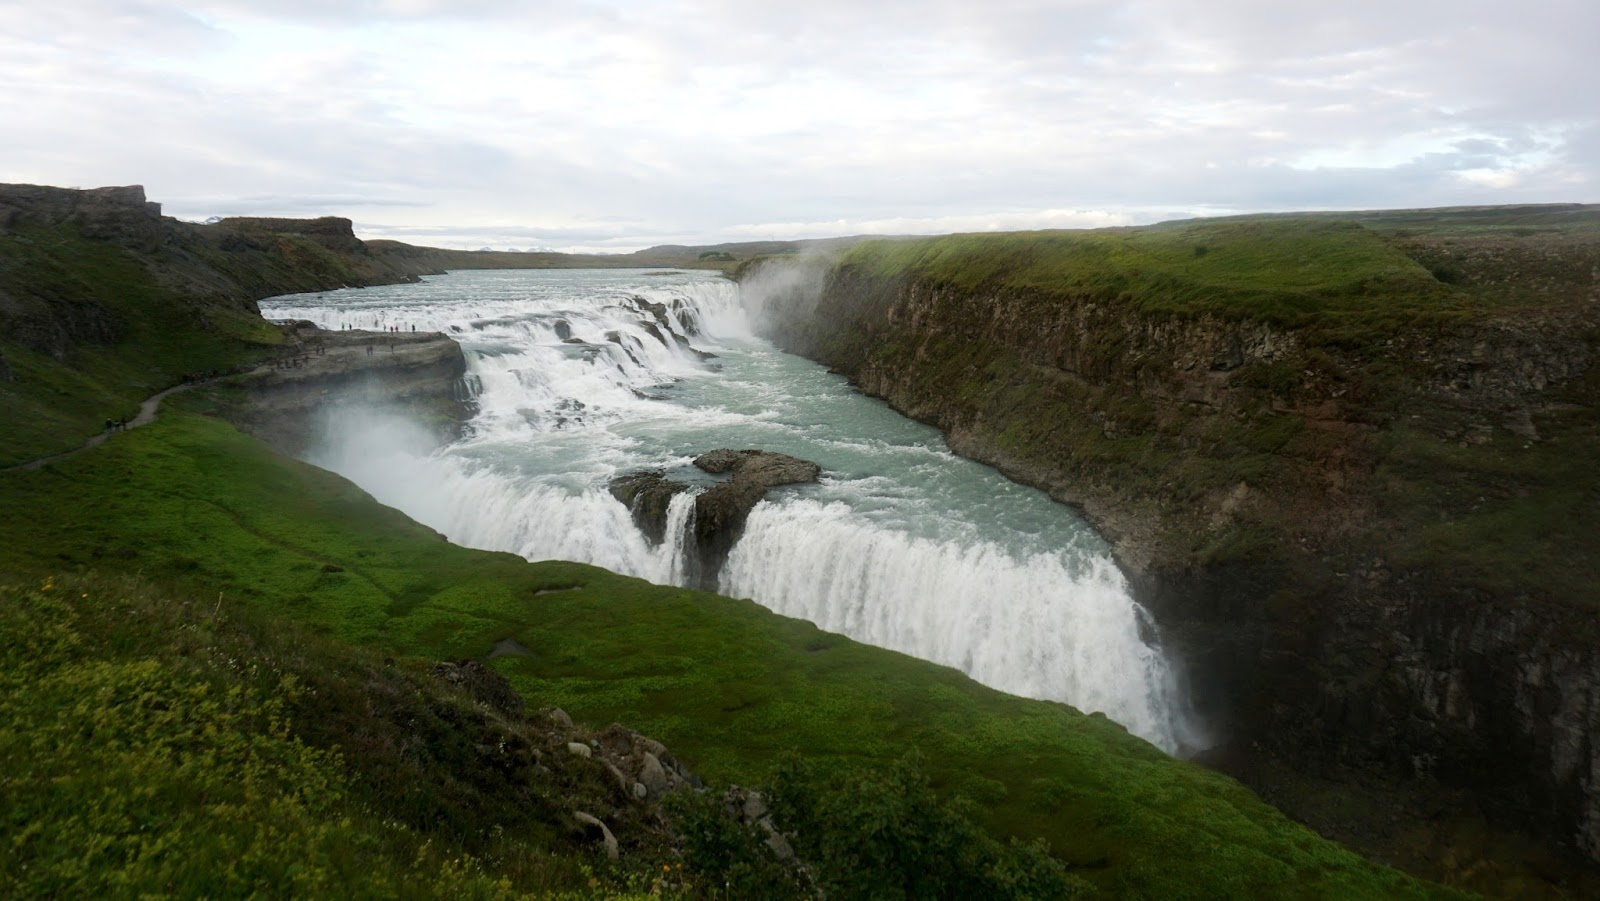 wodospad Gullfoss, islandzki wodospad, Gullfoss, panidorcia, blog o Islandii